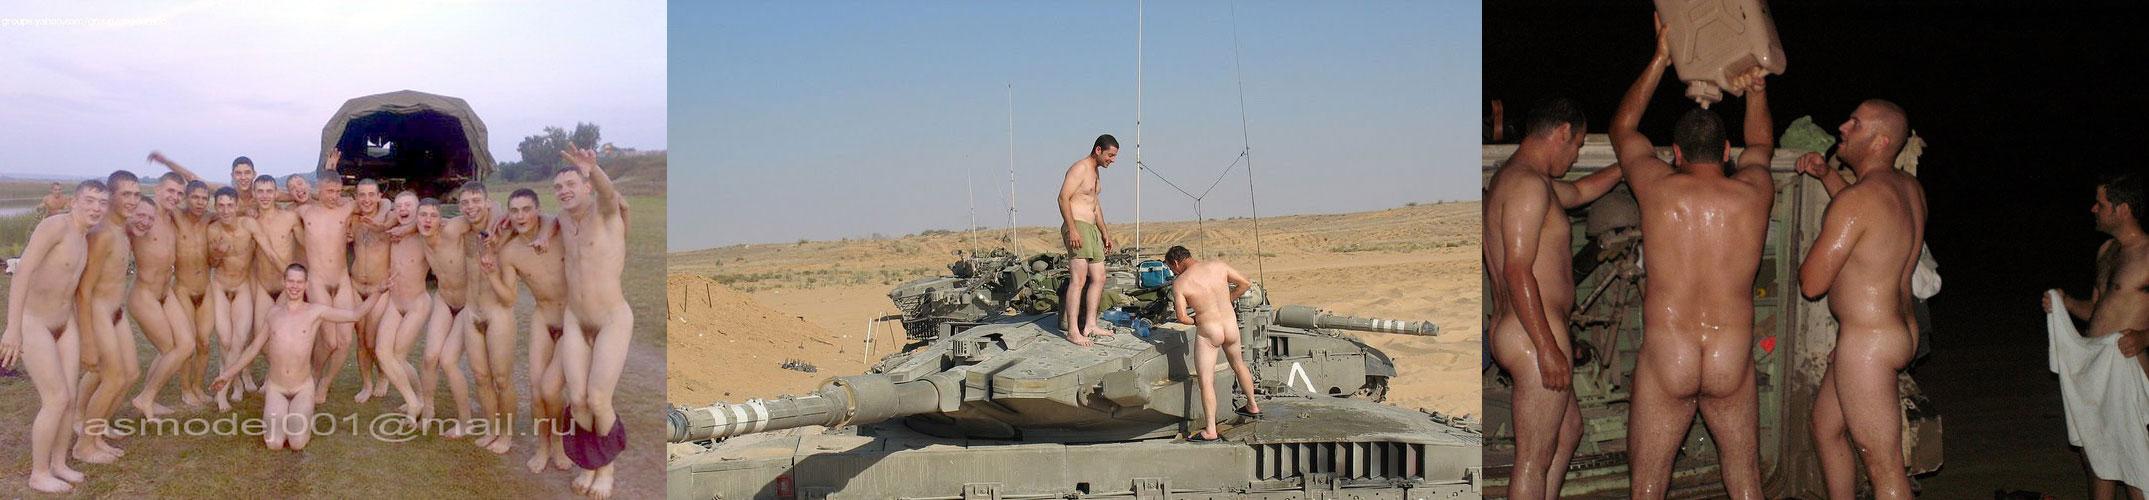 GAY MILITARY Nude Pics Megan Fox